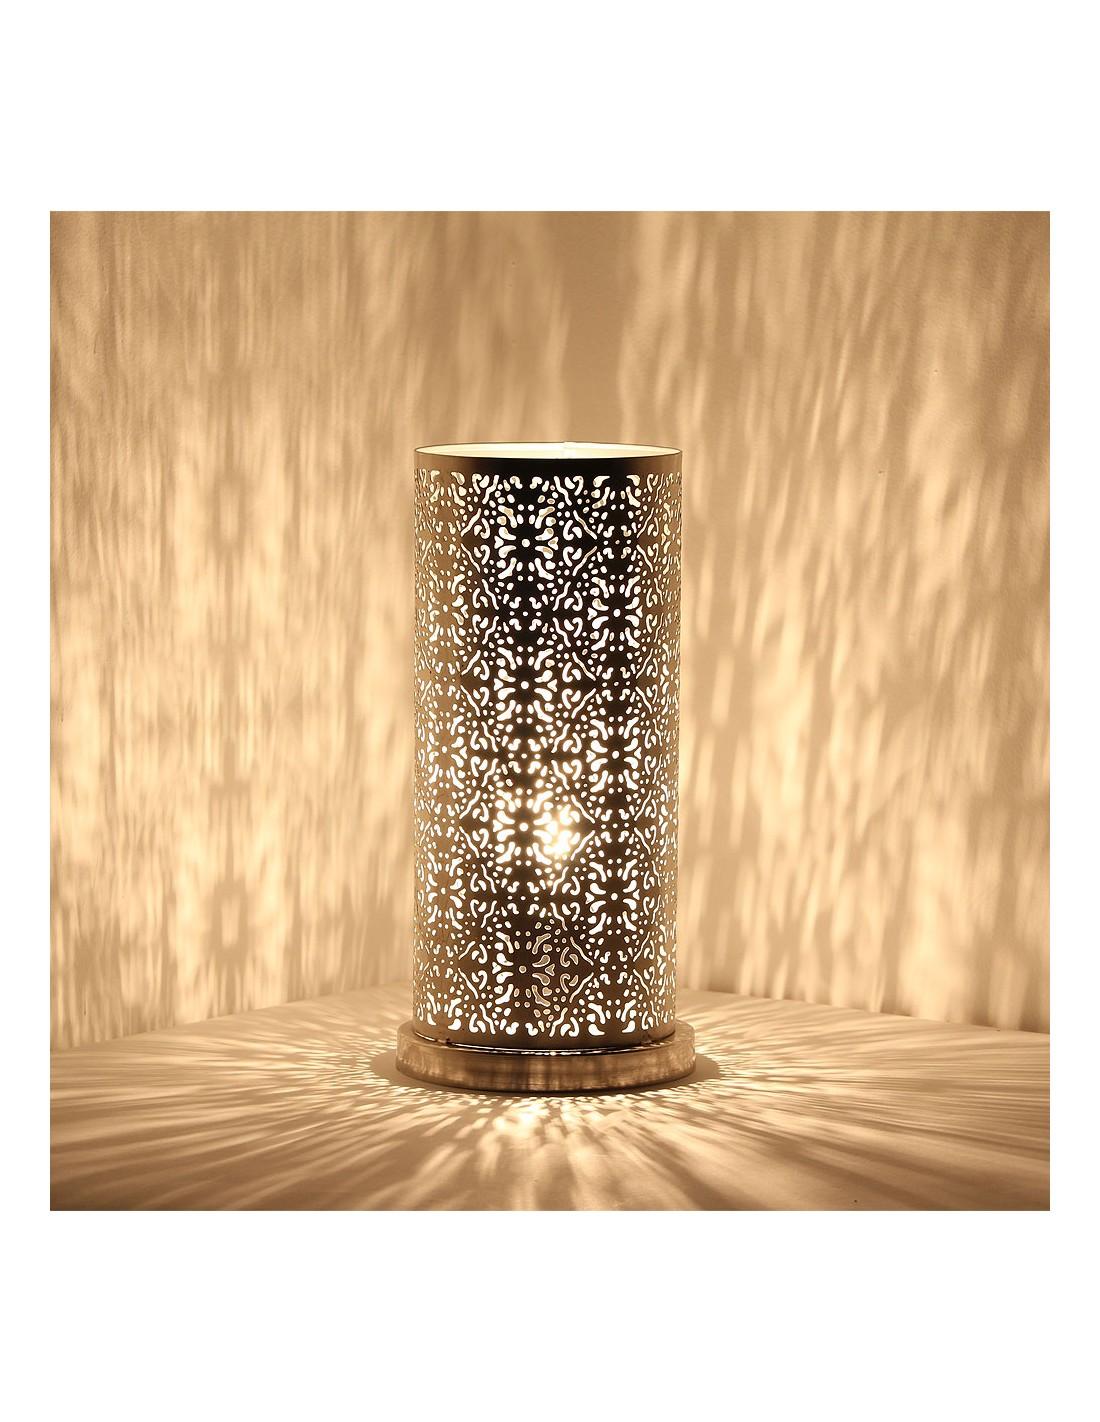 orientalische tischlampe lakia 30cm in silber albena shop. Black Bedroom Furniture Sets. Home Design Ideas